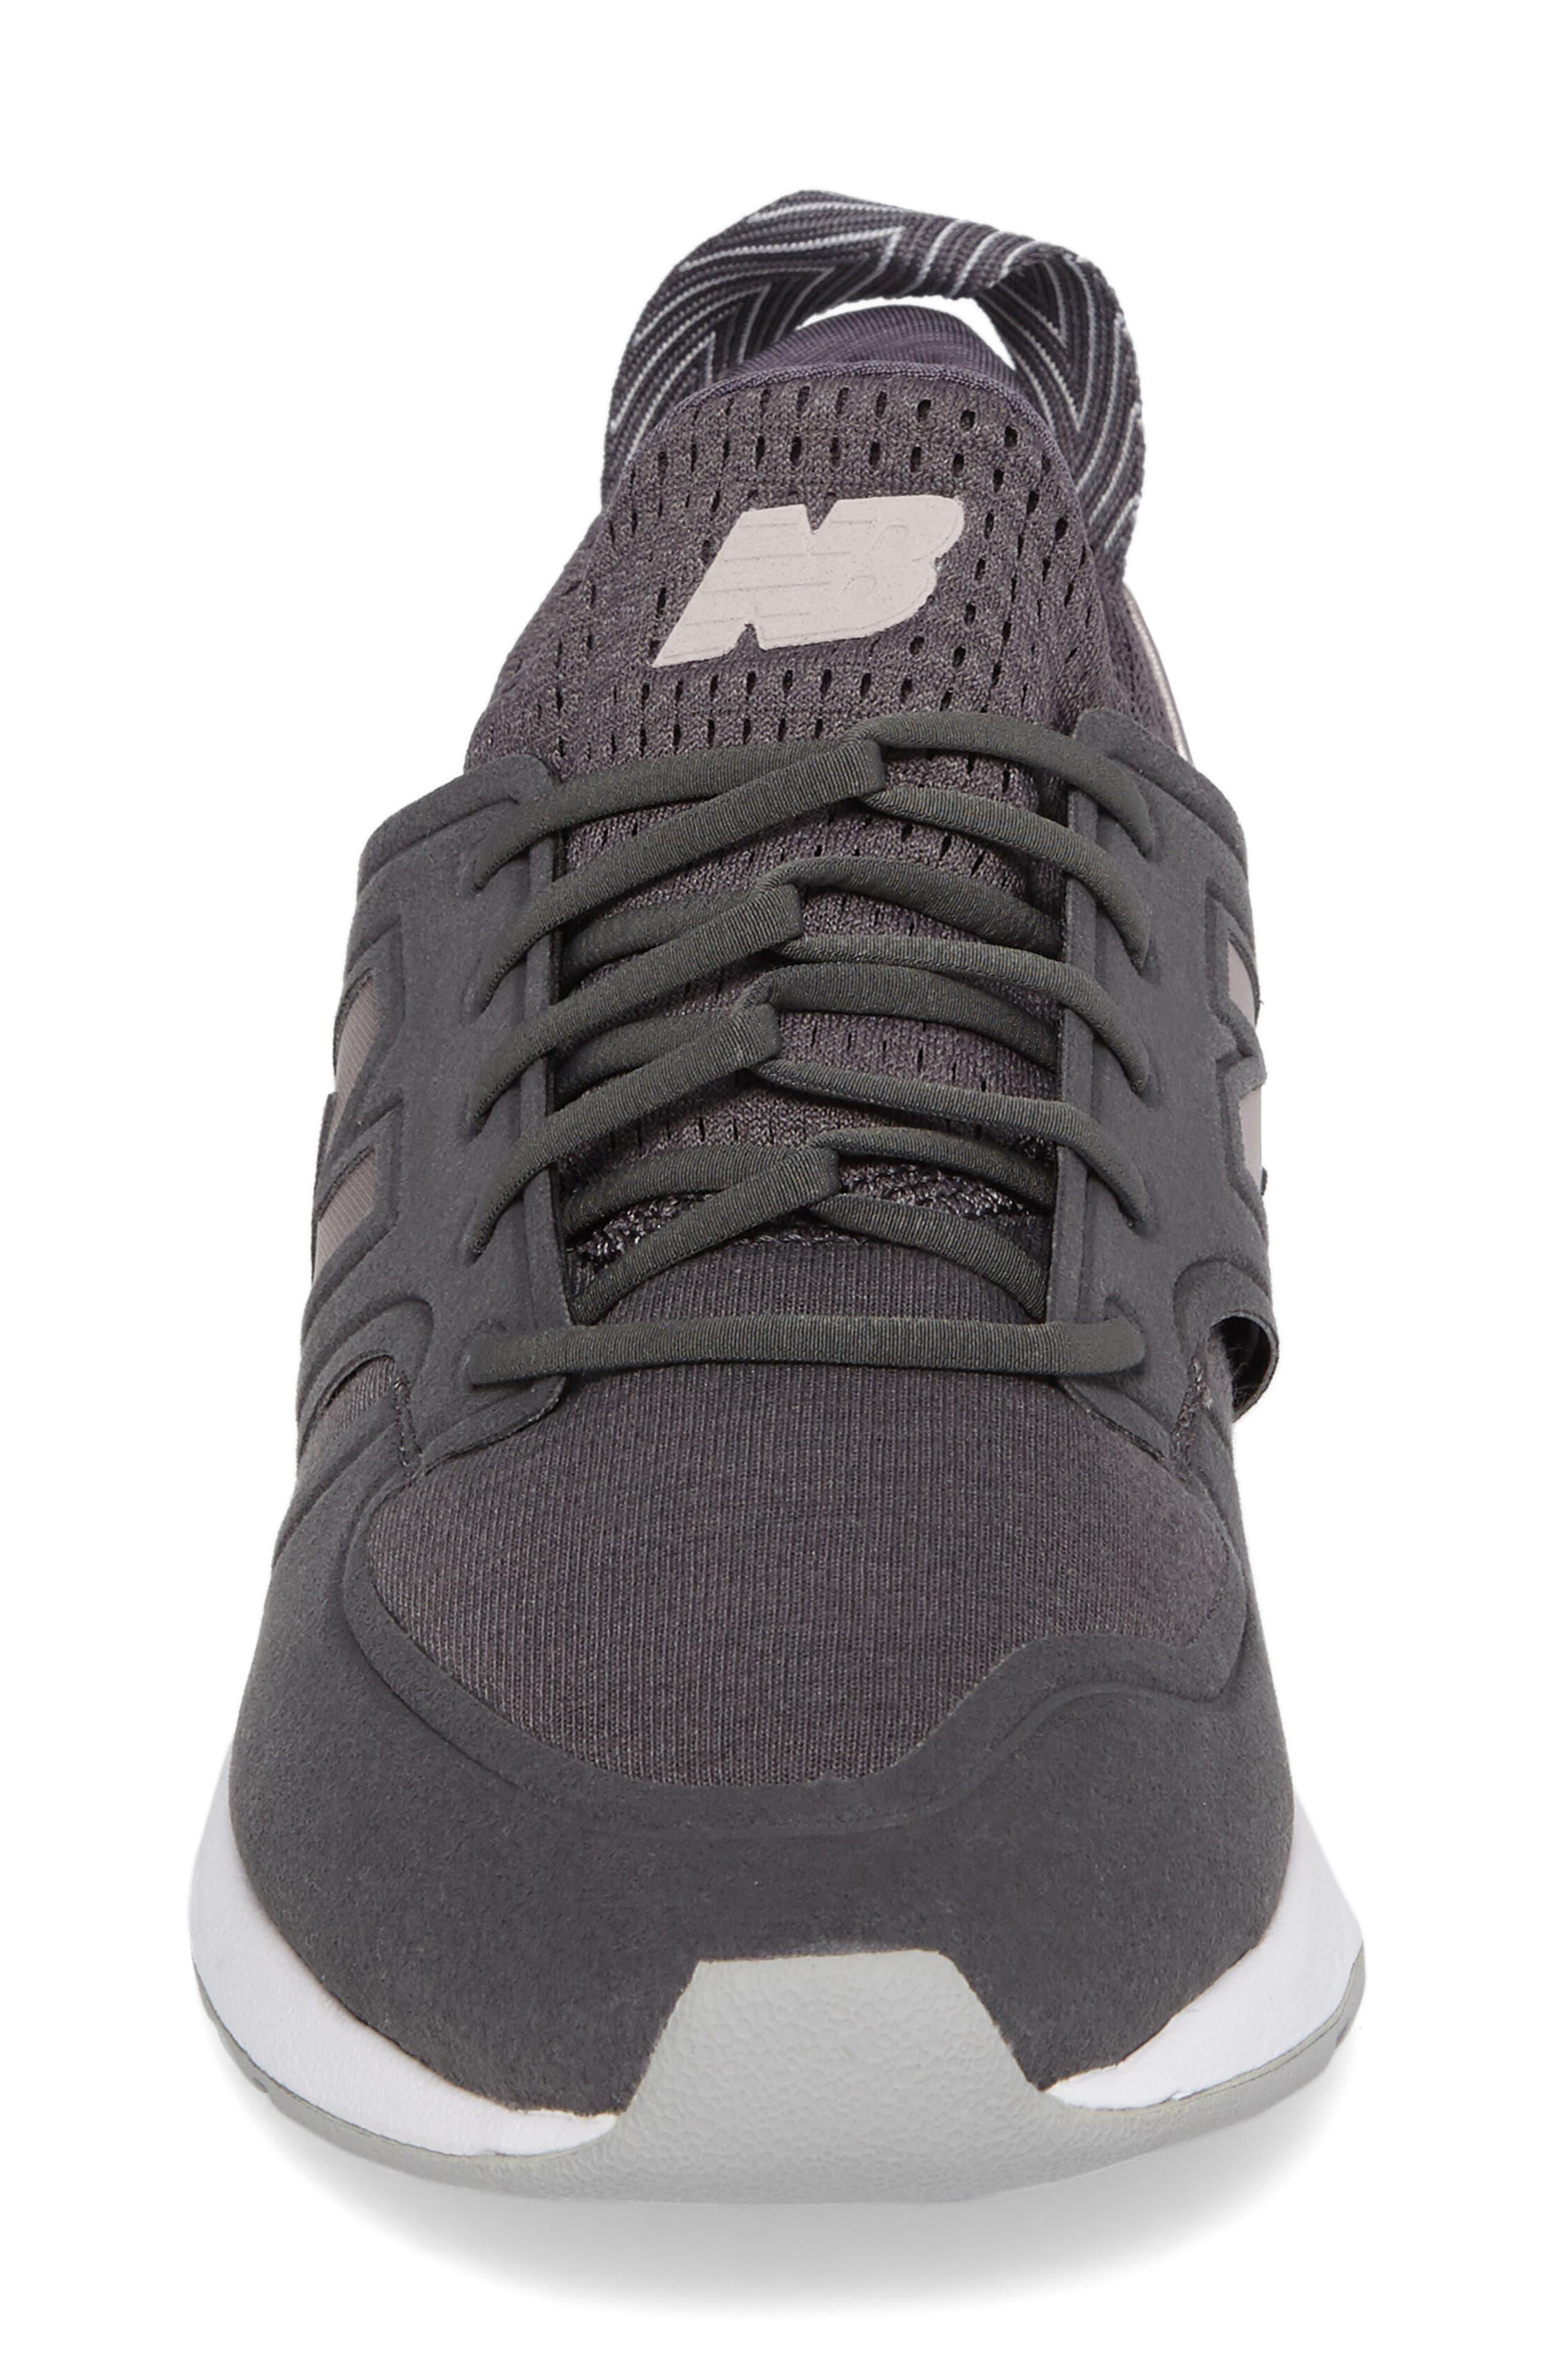 NEW BALANCE, '420' Sneaker, Alternate thumbnail 4, color, 021